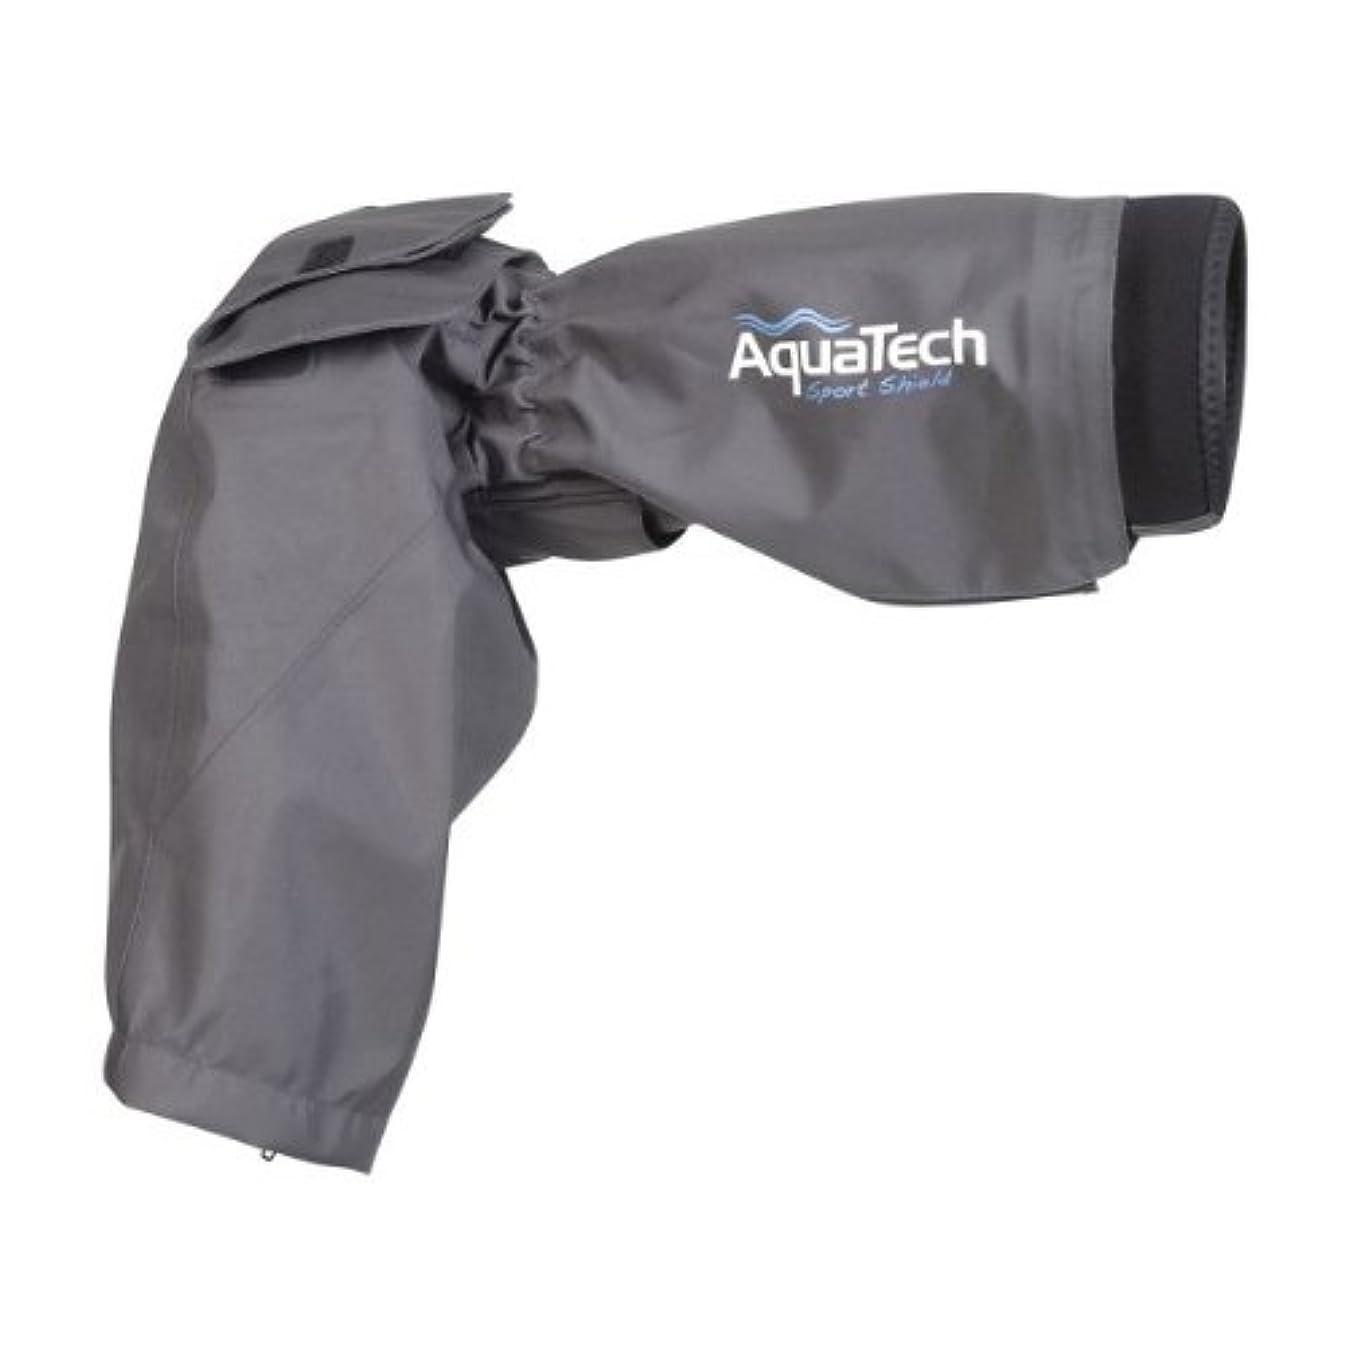 AquaTech SS-200 Sport Shield Rain Cover (Grey)